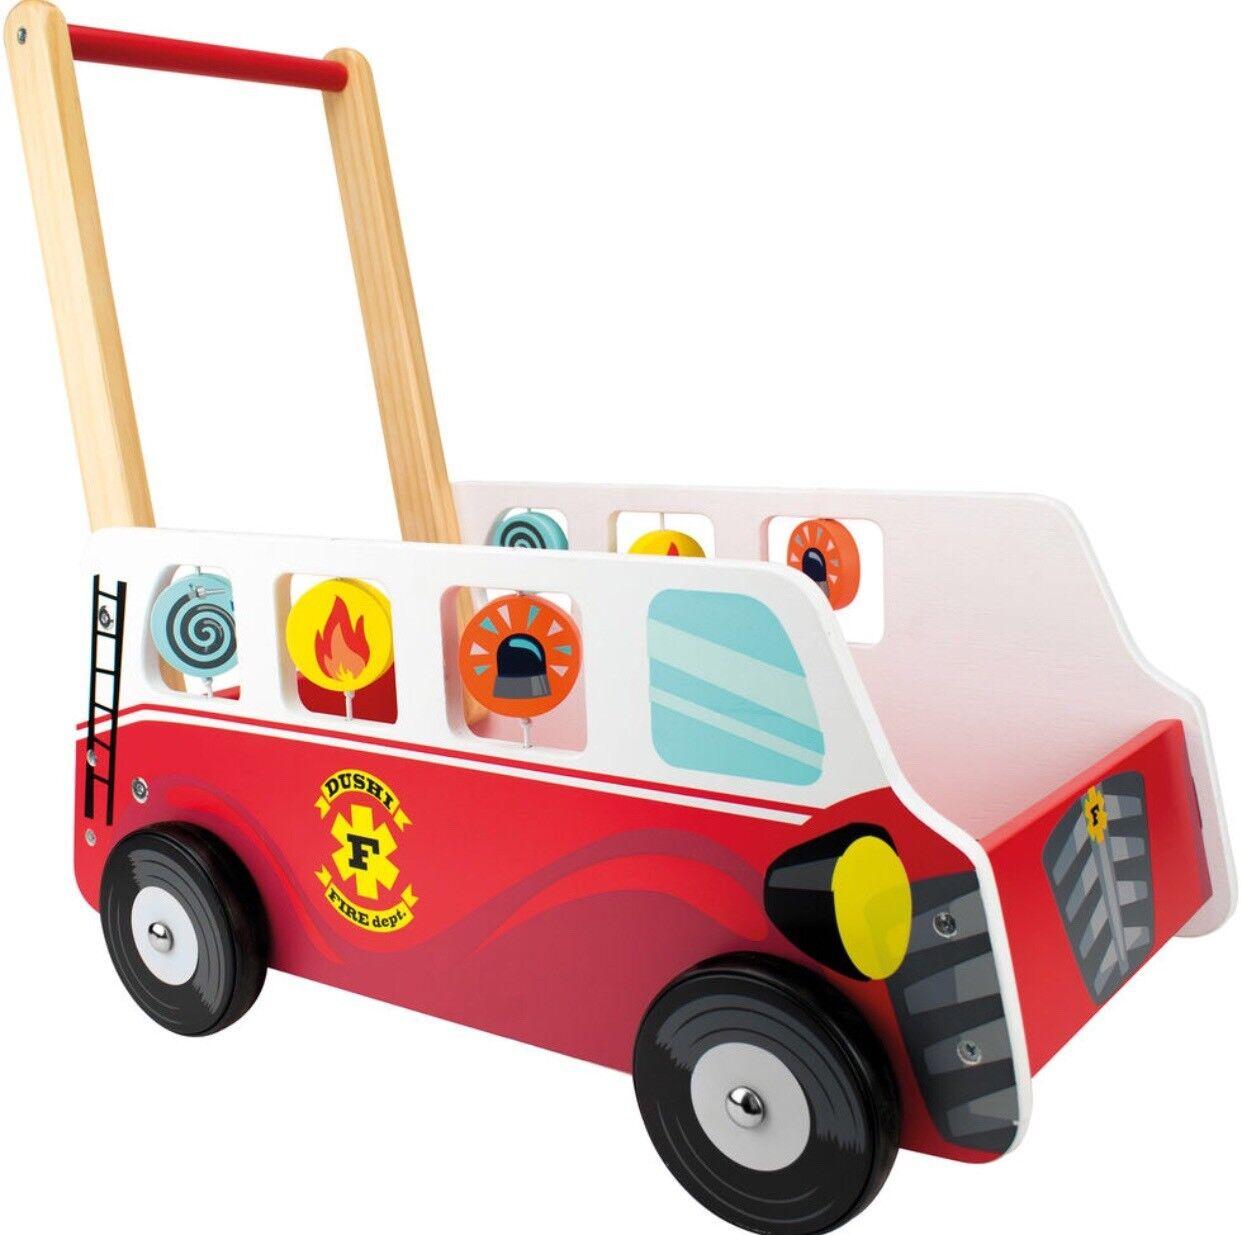 DUSHI Wooden Push Car Fire Bus 12m+ Brand New